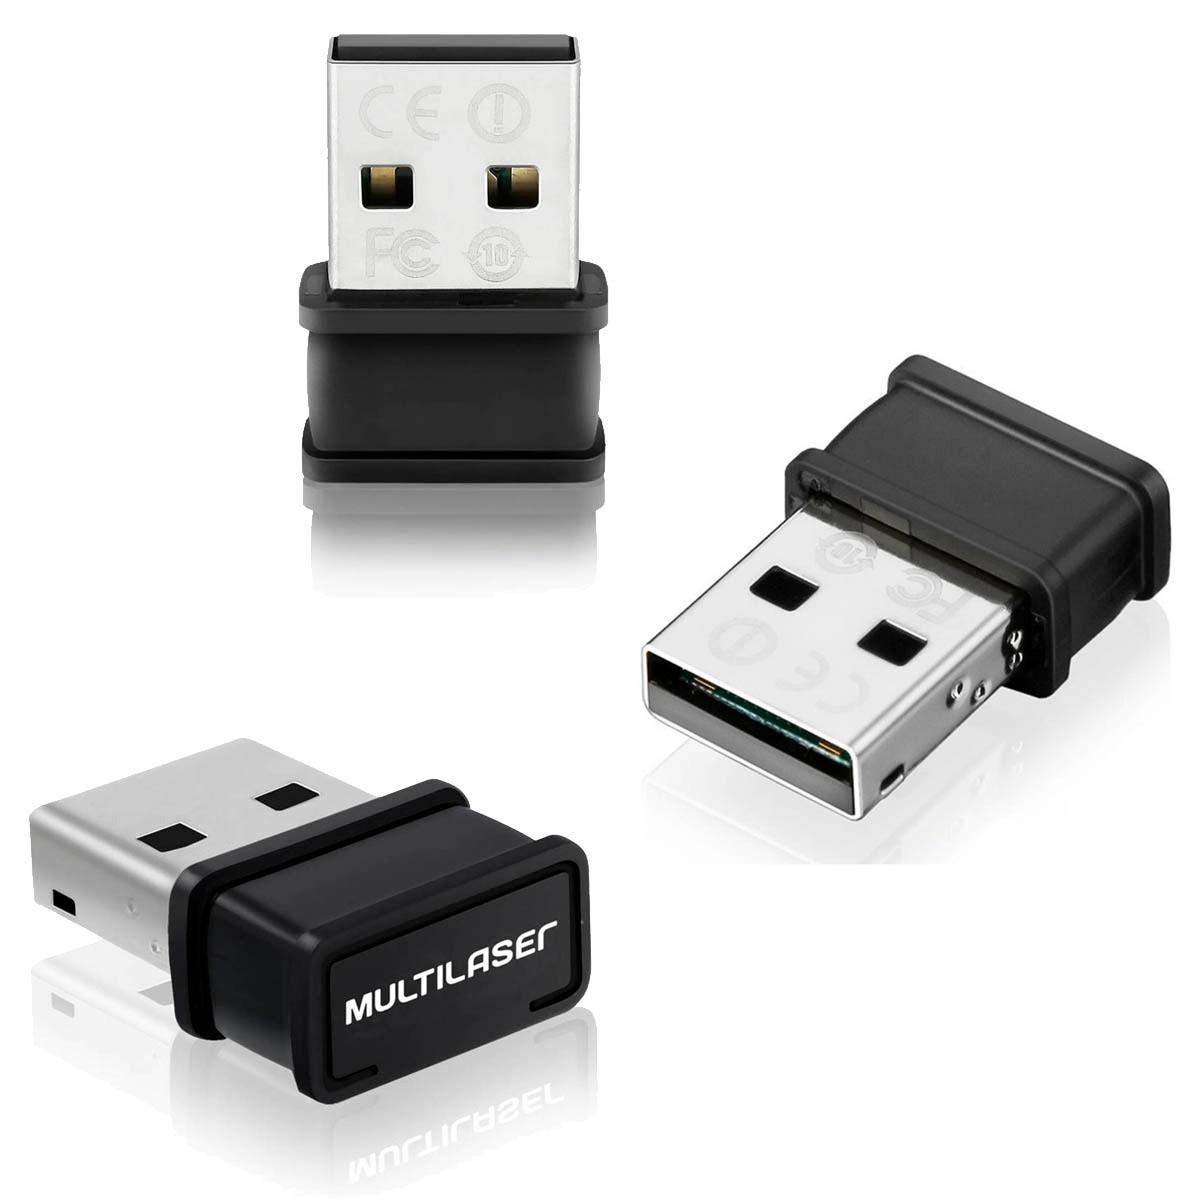 ADAPTADOR WIRELESS NANO USB 150 MBPS DONGLE (05)